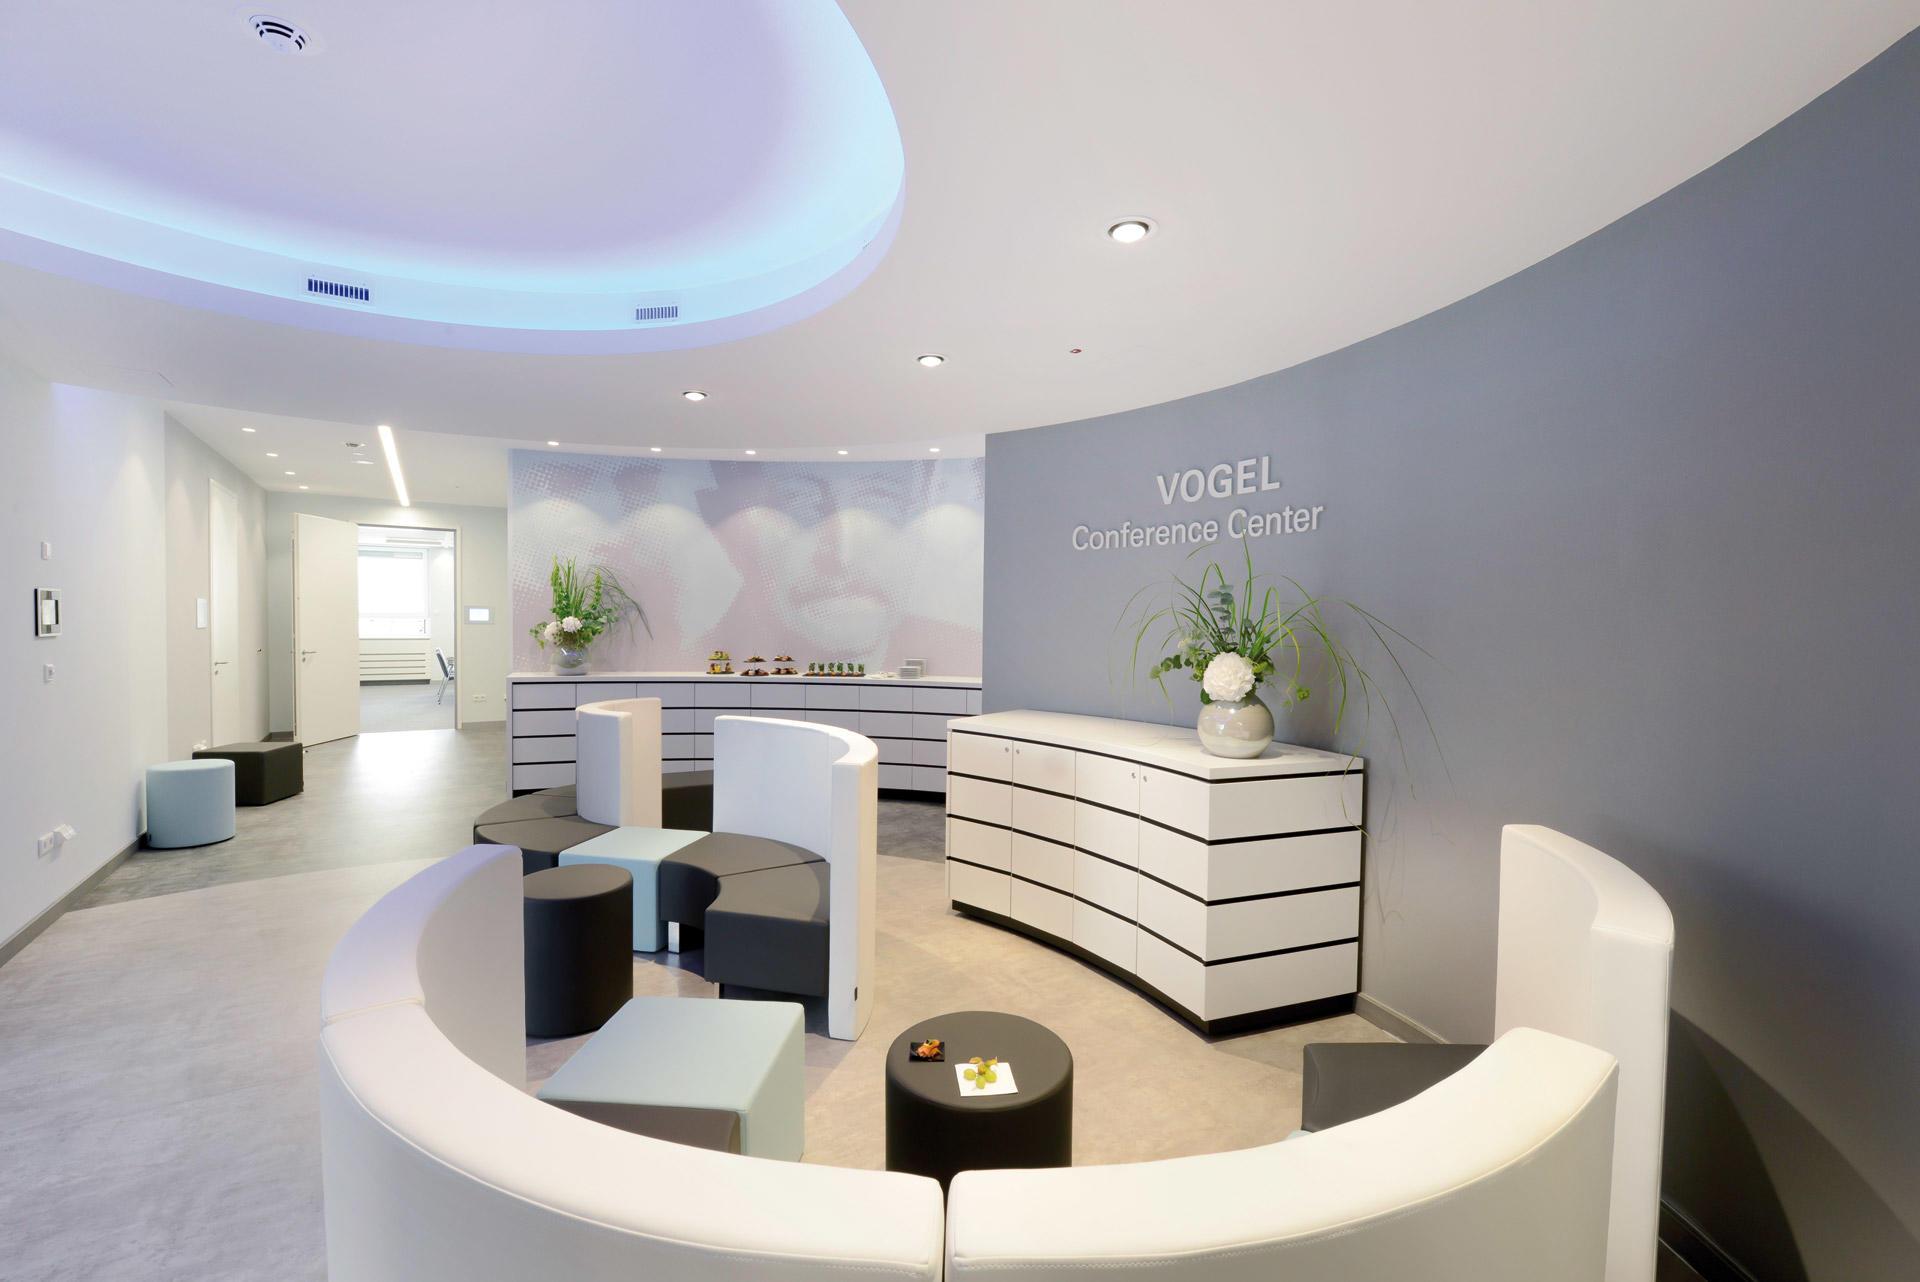 VCC Vogel Convention Center GmbH - 3 Fotos - Würzburg Zellerau - Max ...